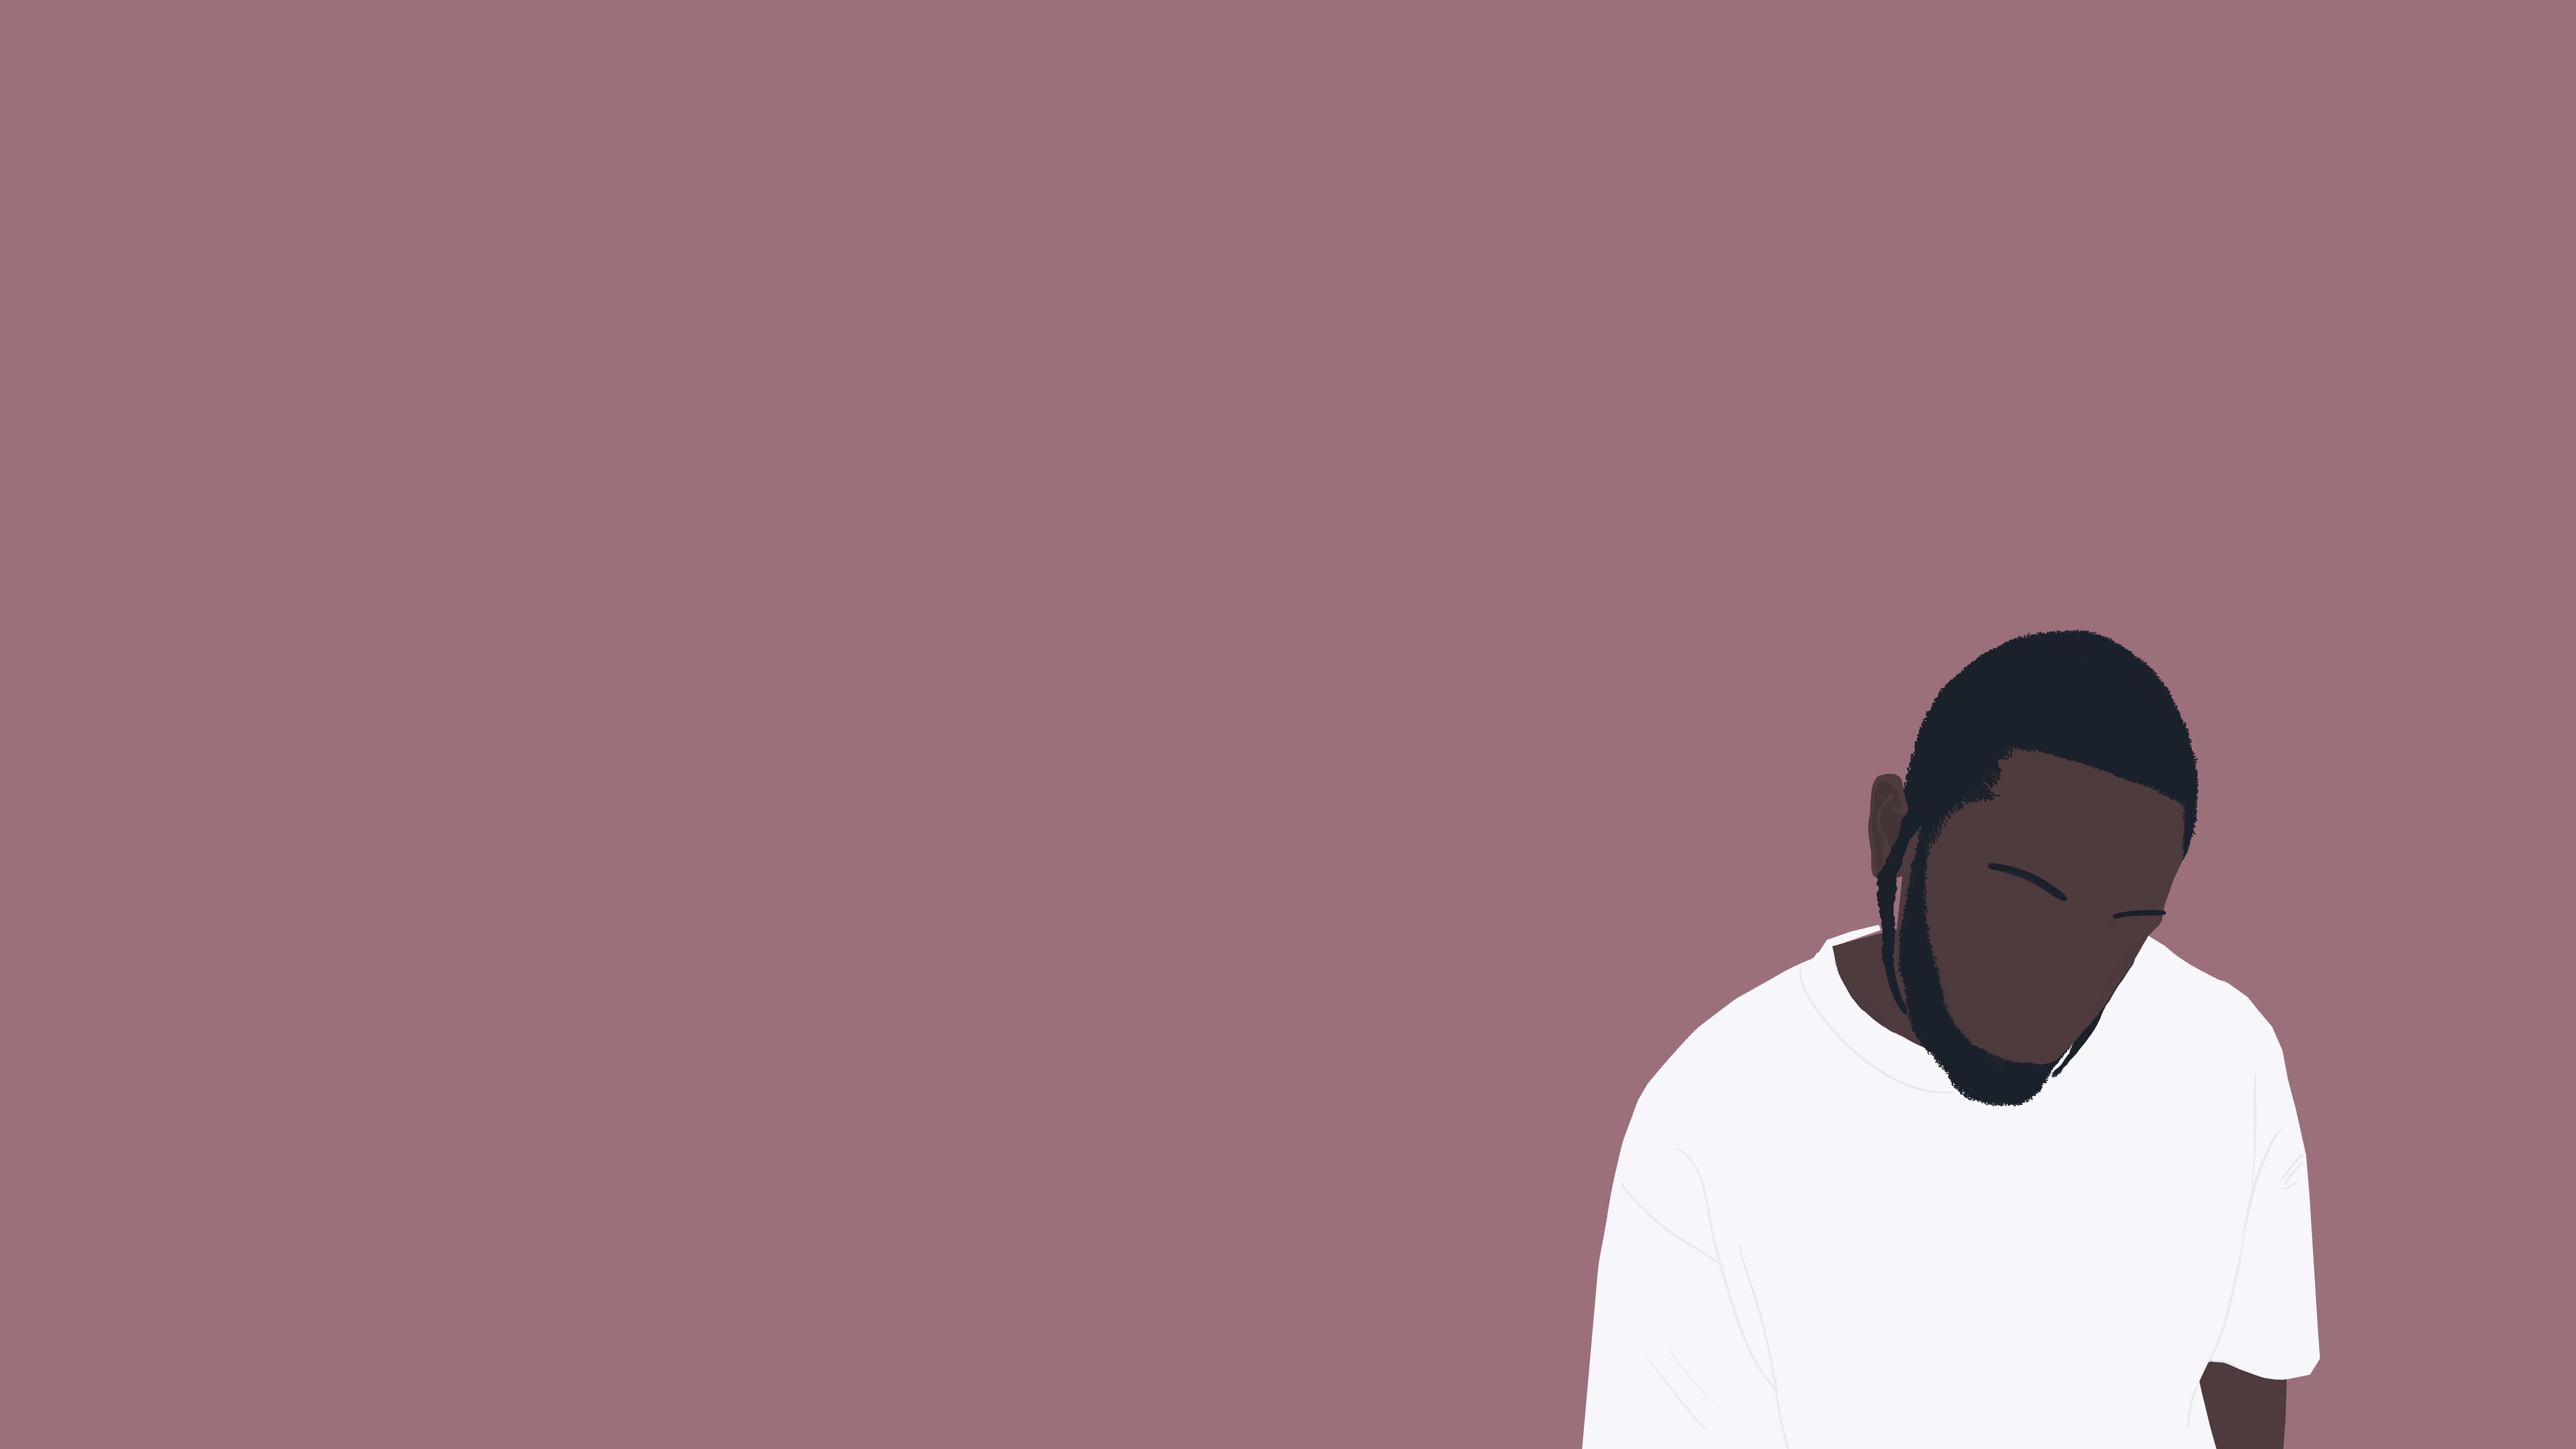 Kendrick lamar minimal hd 8k wallpaper - 8k minimal wallpaper ...